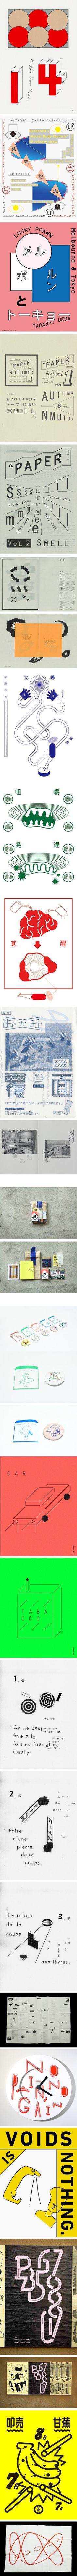 The work of Tadashi Ueda  via http://tadashiueda.tumblr.com/